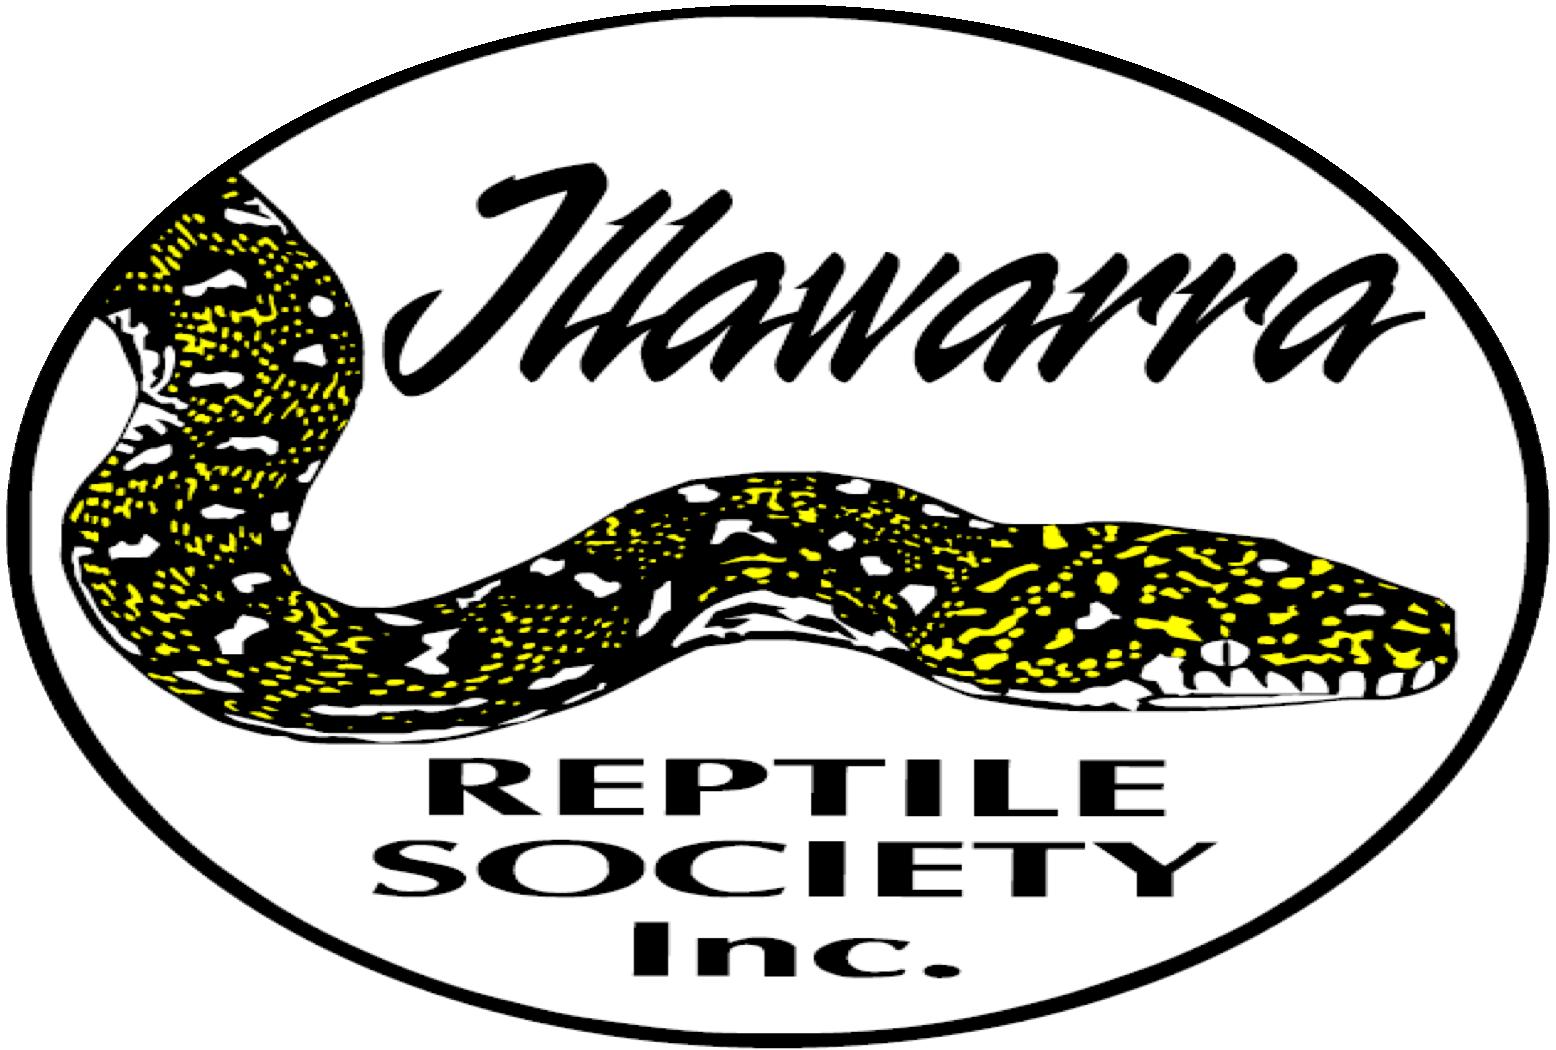 Illawarra Reptile Society